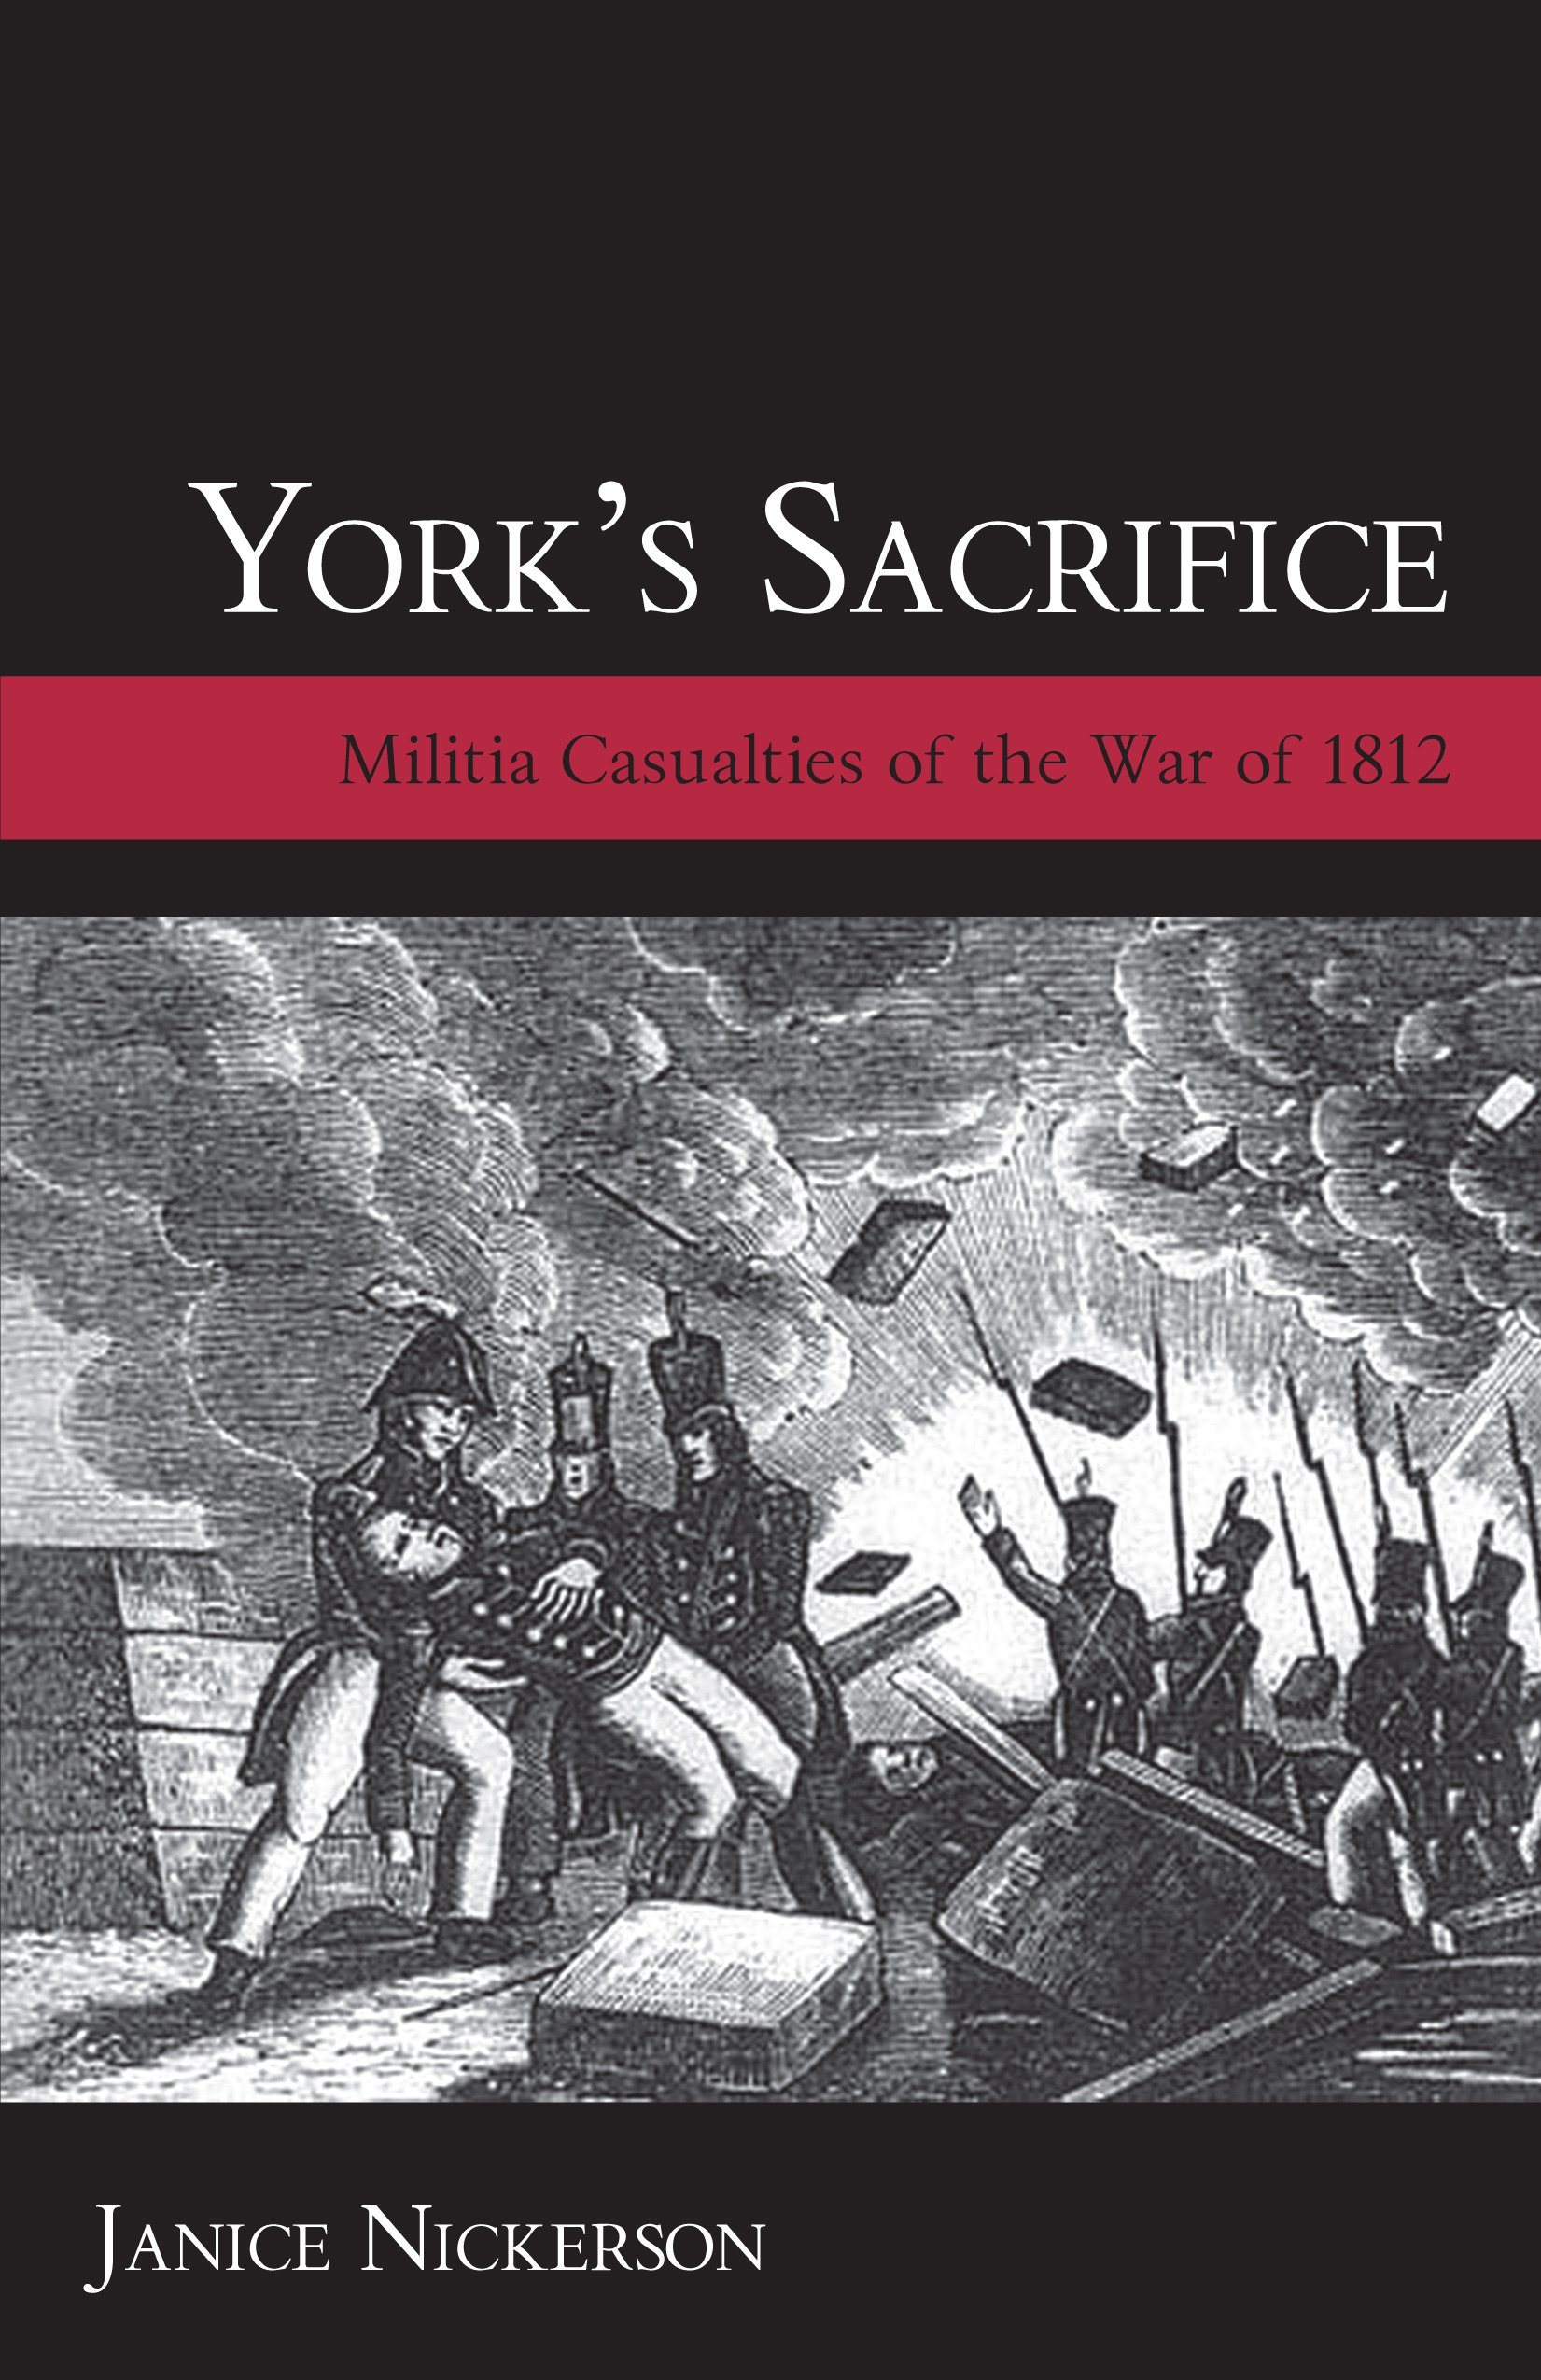 York's Sacrifice: Militia Casualties of the War of 1812